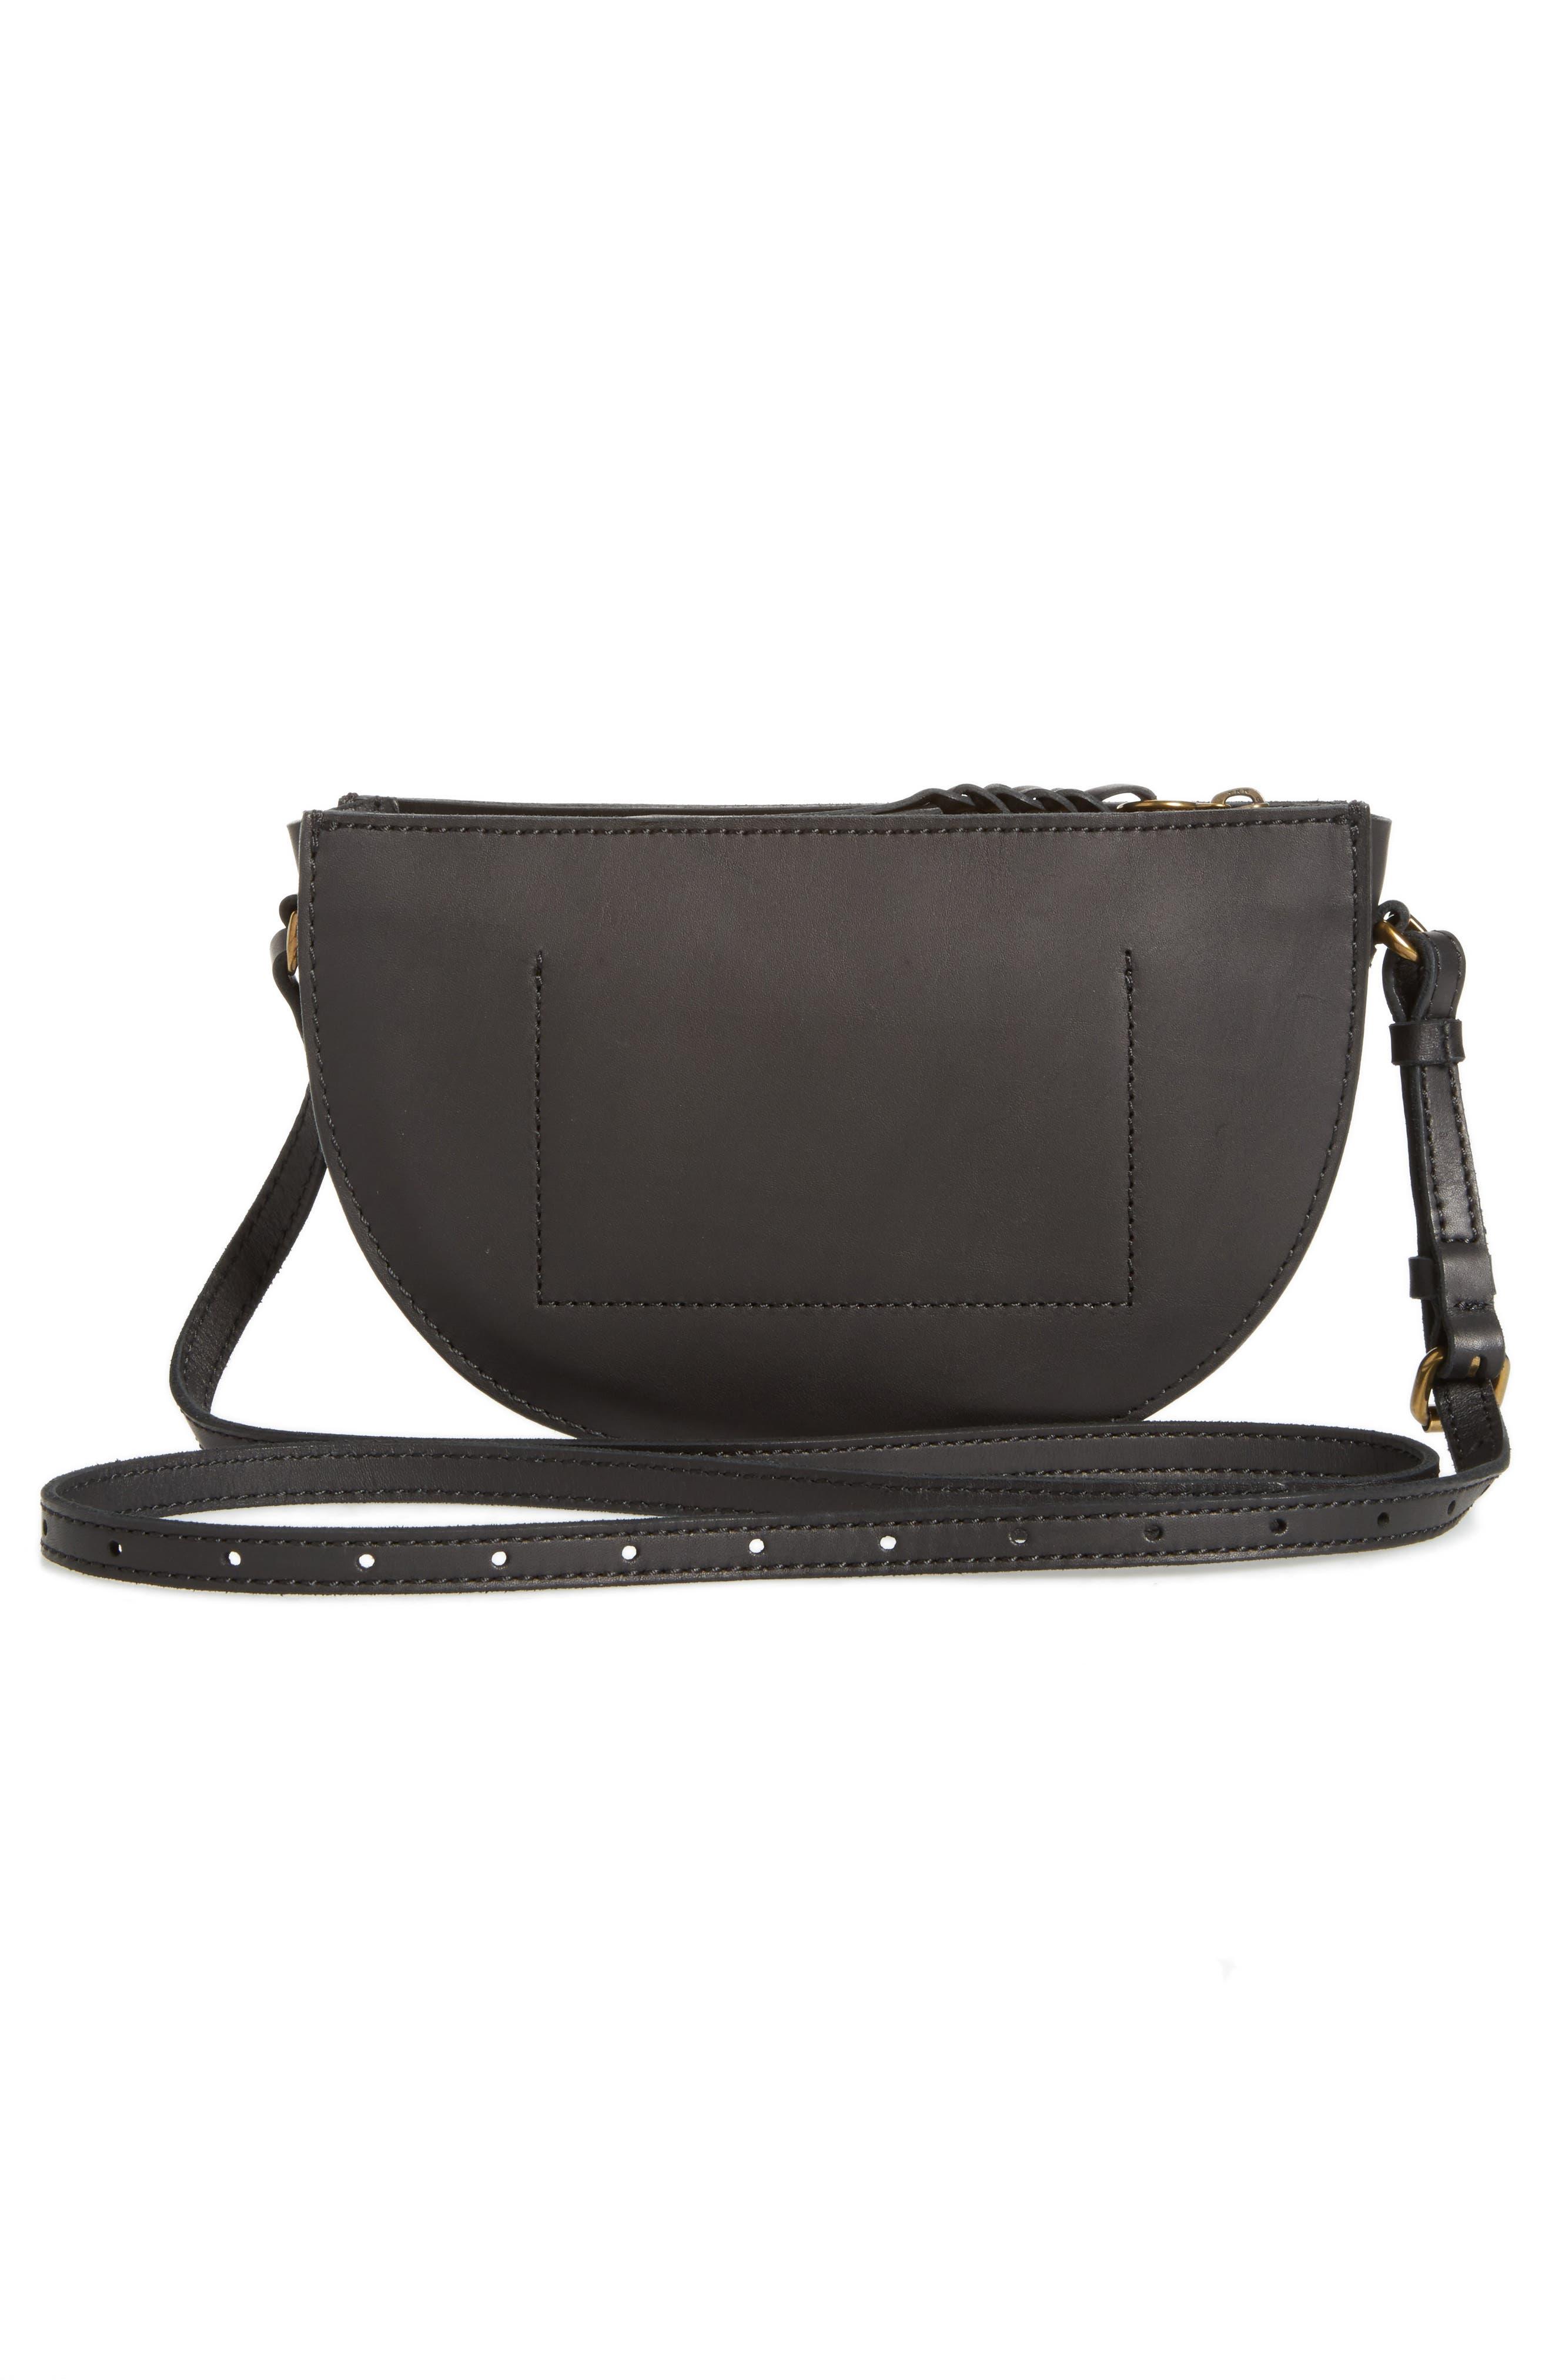 Juniper Vachetta Leather Half Moon Crossbody Bag,                             Alternate thumbnail 3, color,                             001